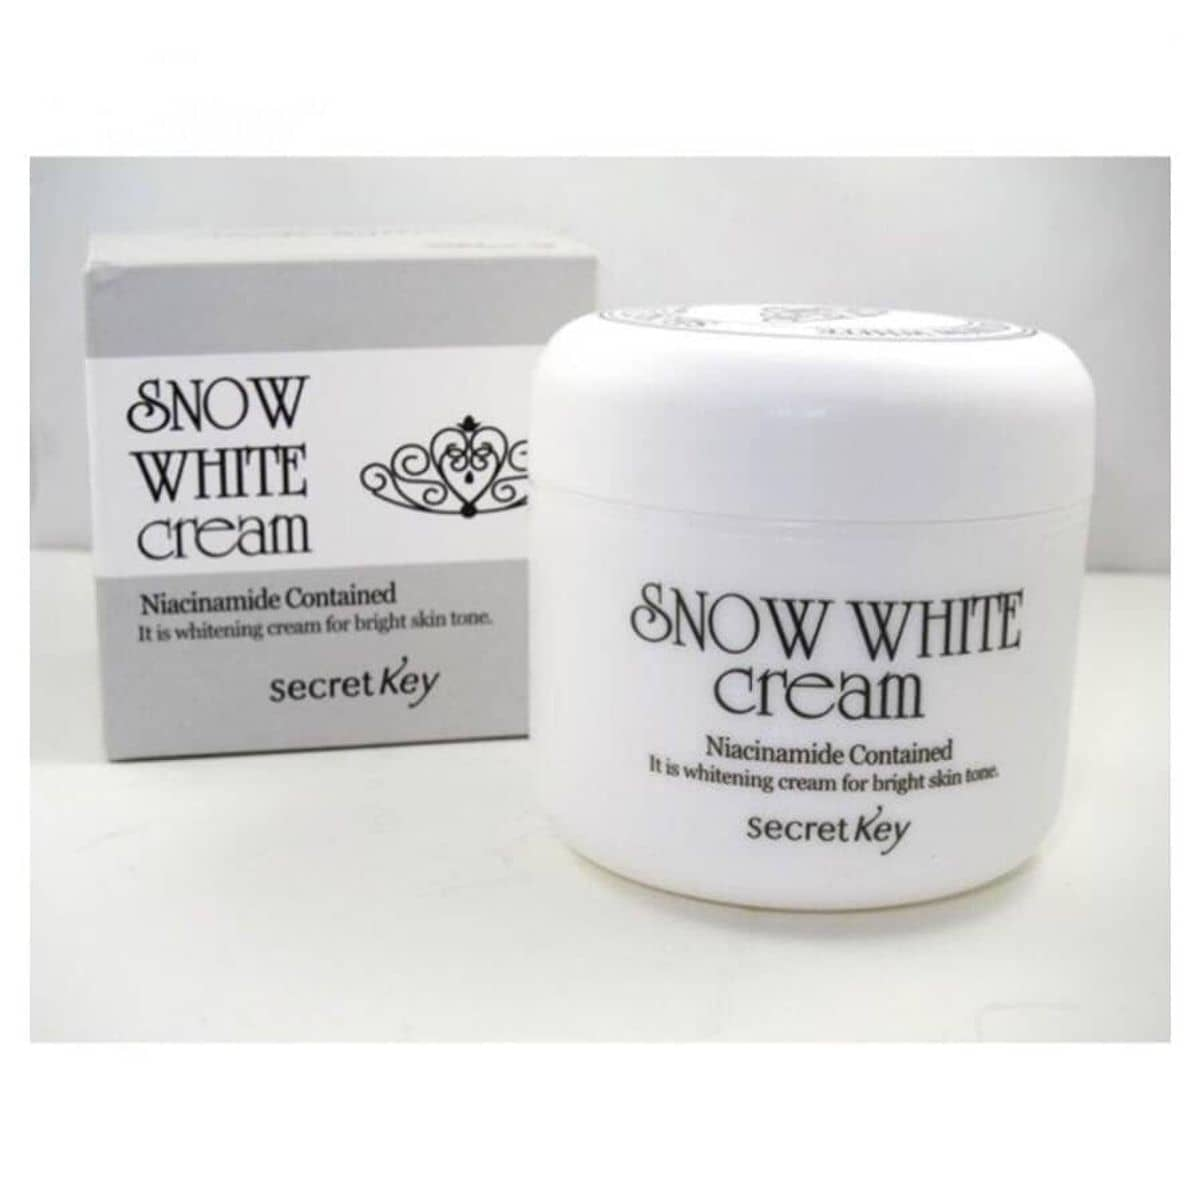 Kem Dng Trng Snow White Cream Ti 36 Qun Thnh Ca Nga Thanh Lozi Secret Key